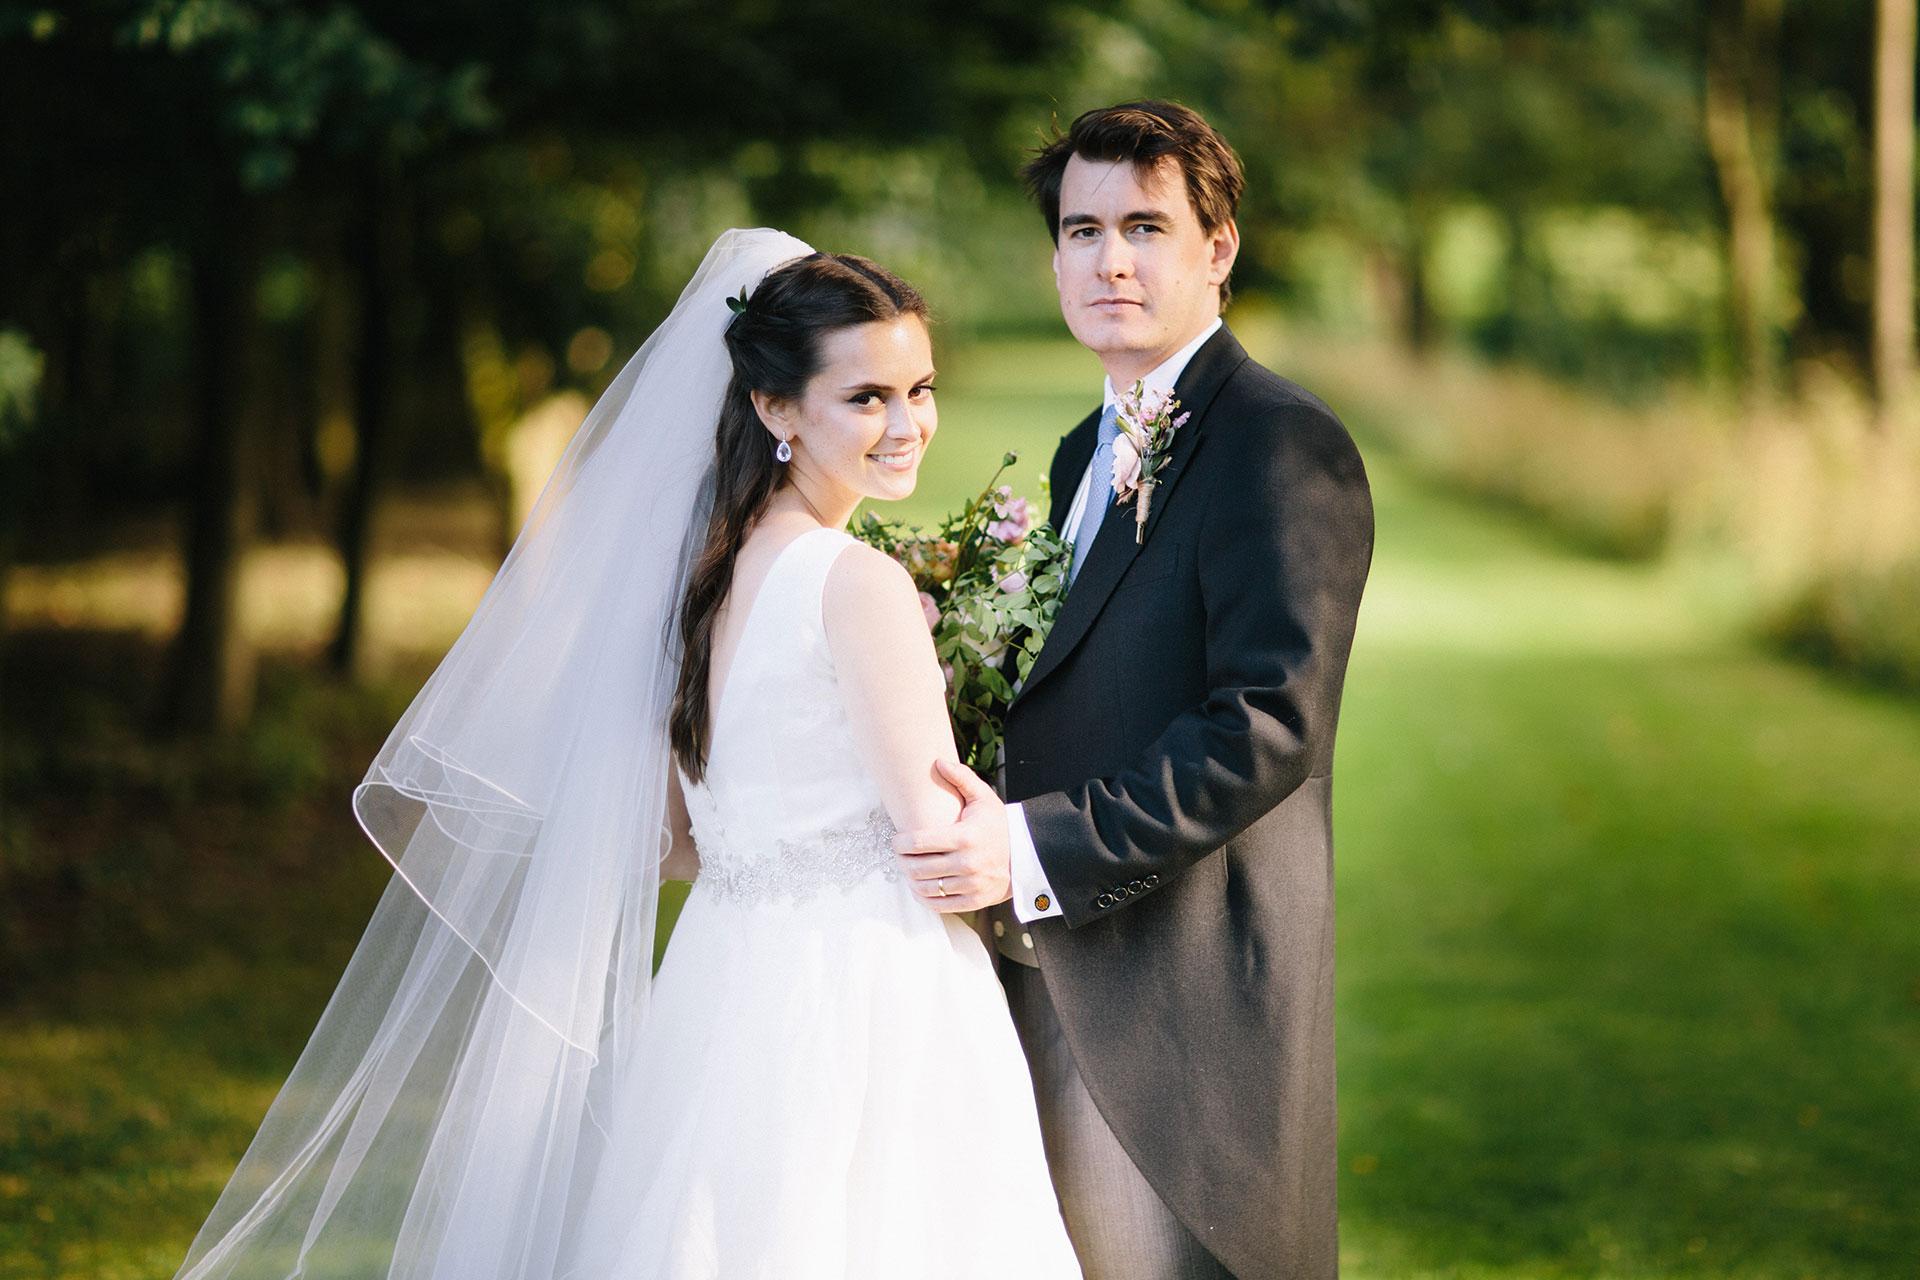 Langar-Hall-wedding-photographer-in-Nottinghamshire-Michael-Newington-Gray-71.jpg